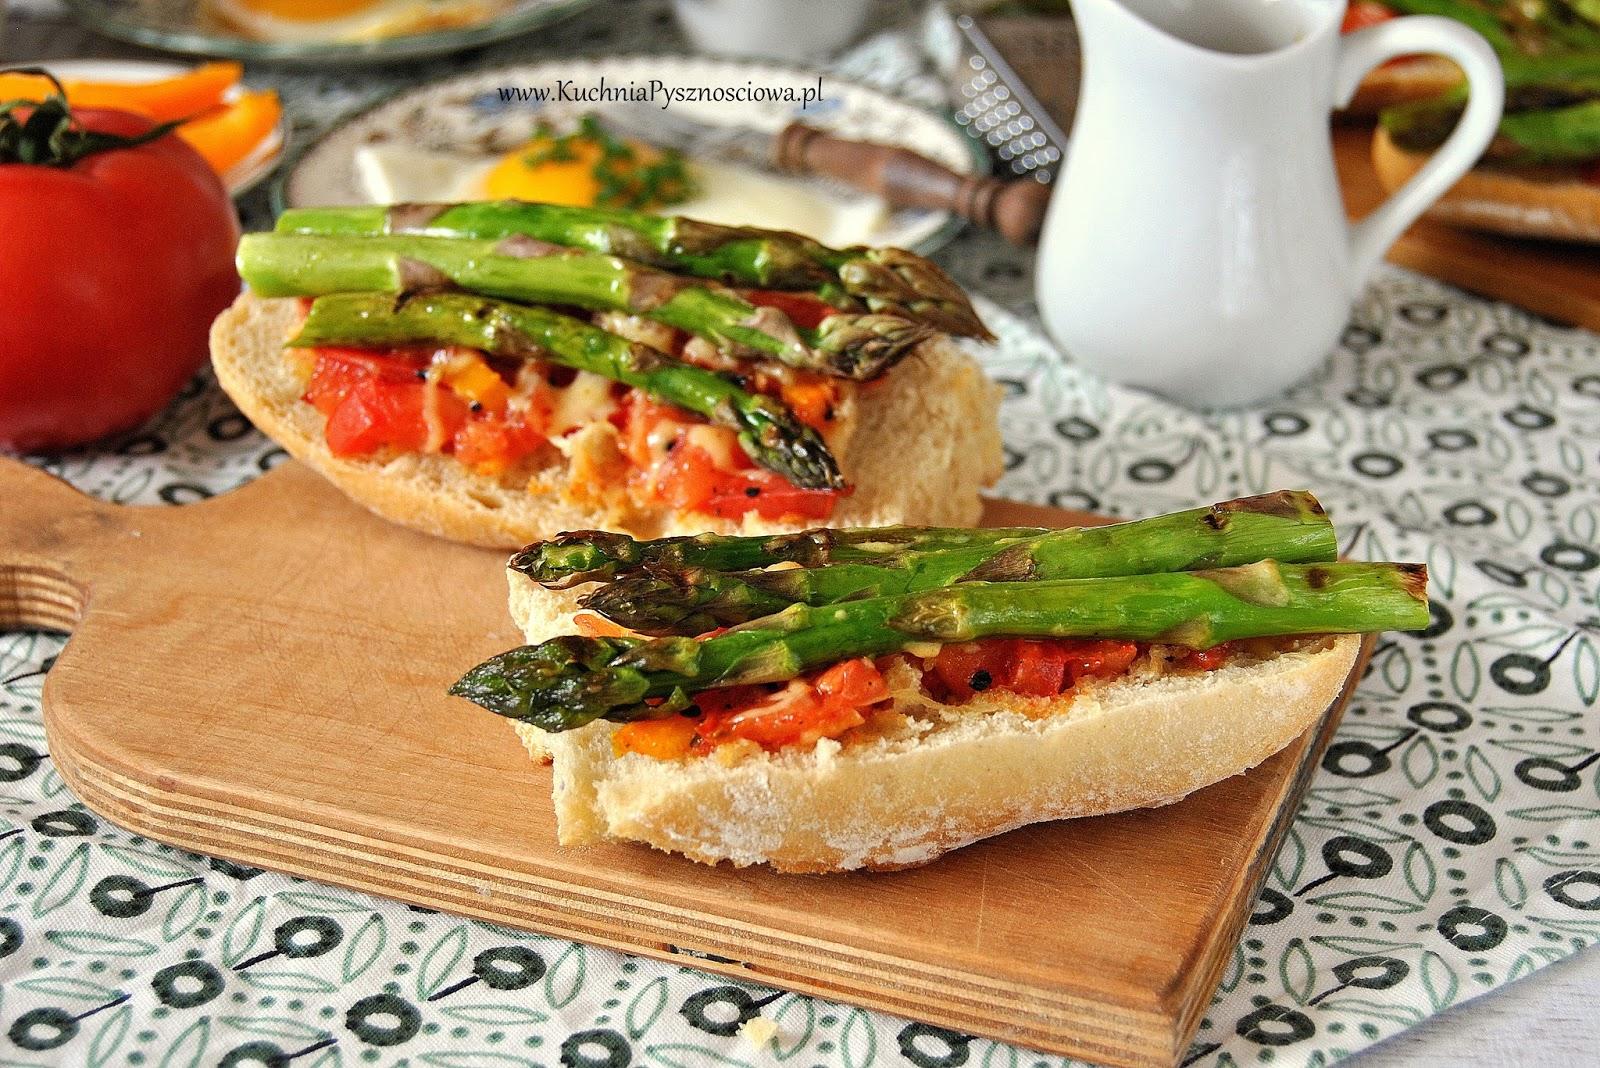 598. Tosty ze szparagami i pomidorami